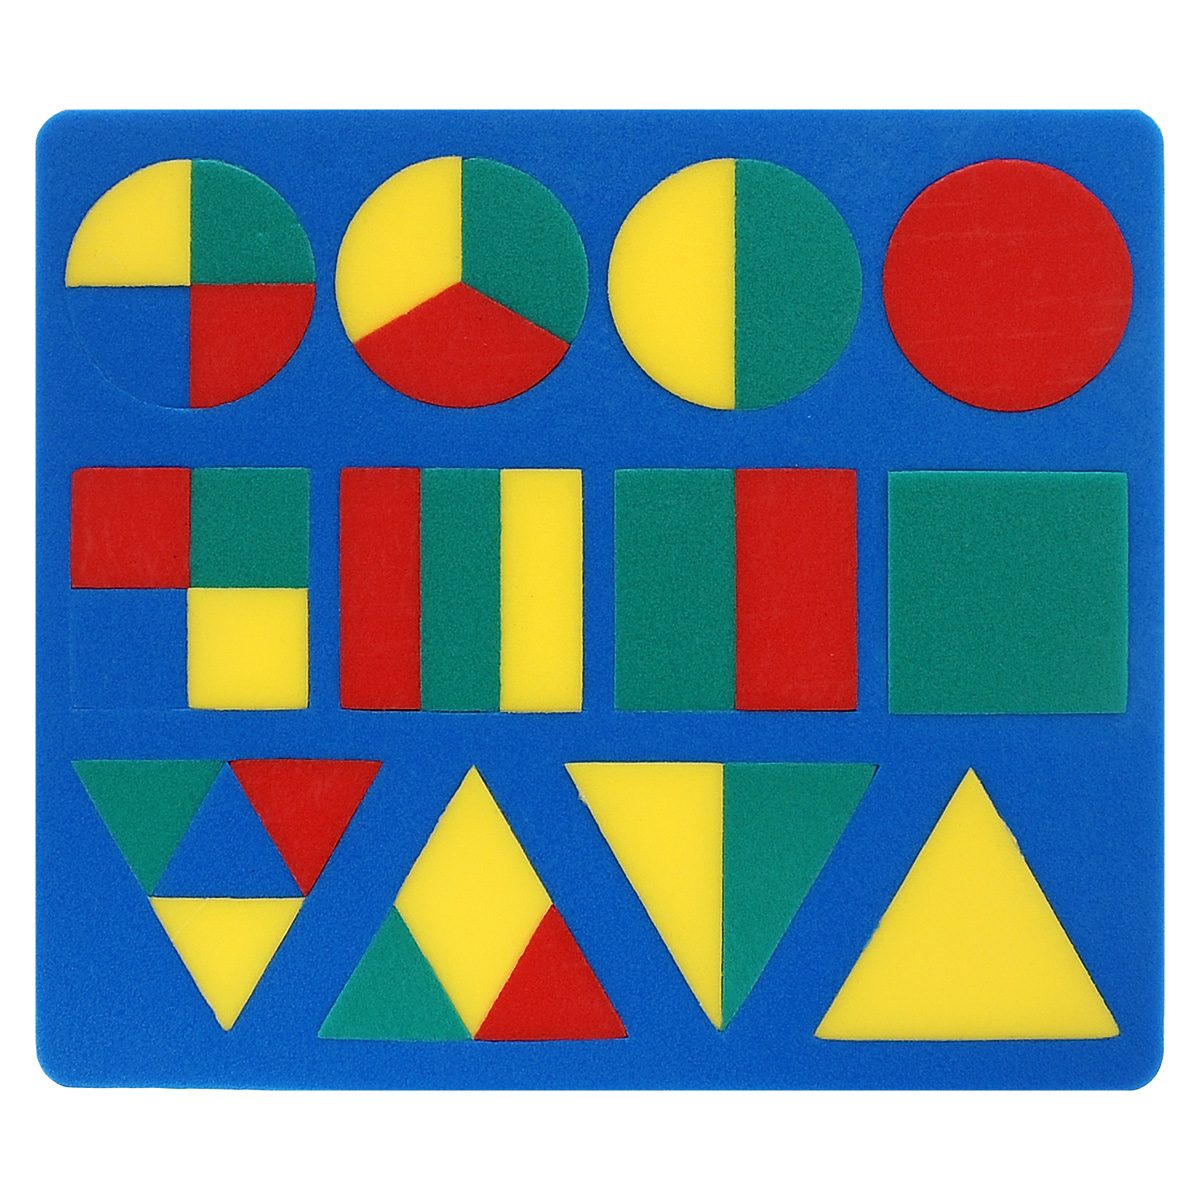 Флексика Пазл для малышей Геометрия цвет основы синий флексика пазл для малышей попугай цвет основы красный